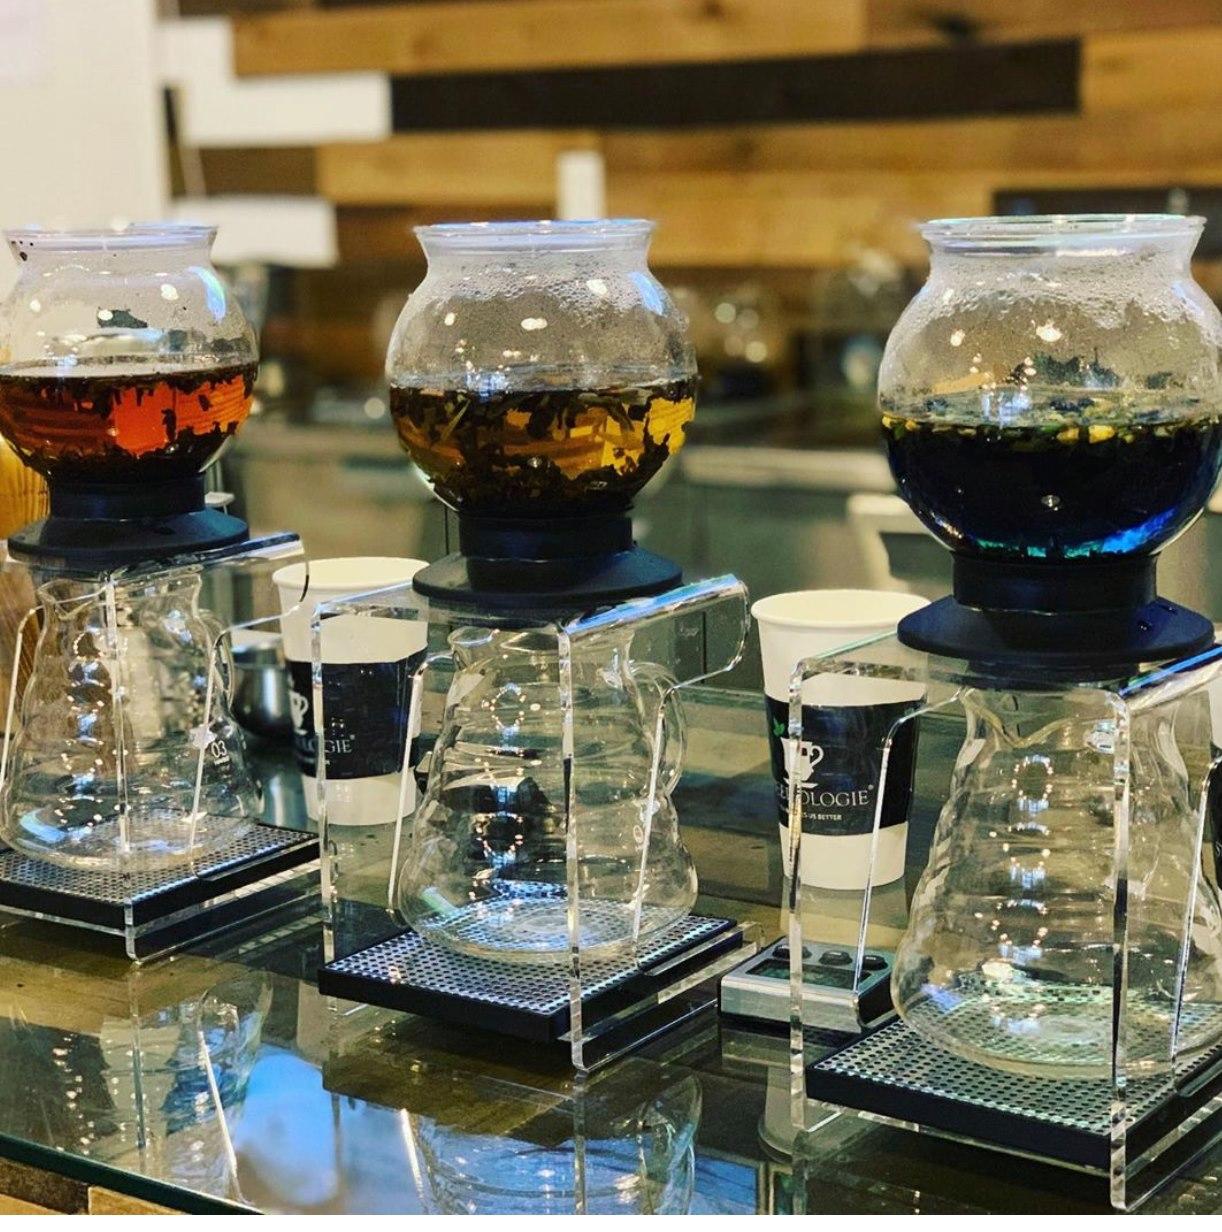 Tea brewing in spherical canters at Steepologie